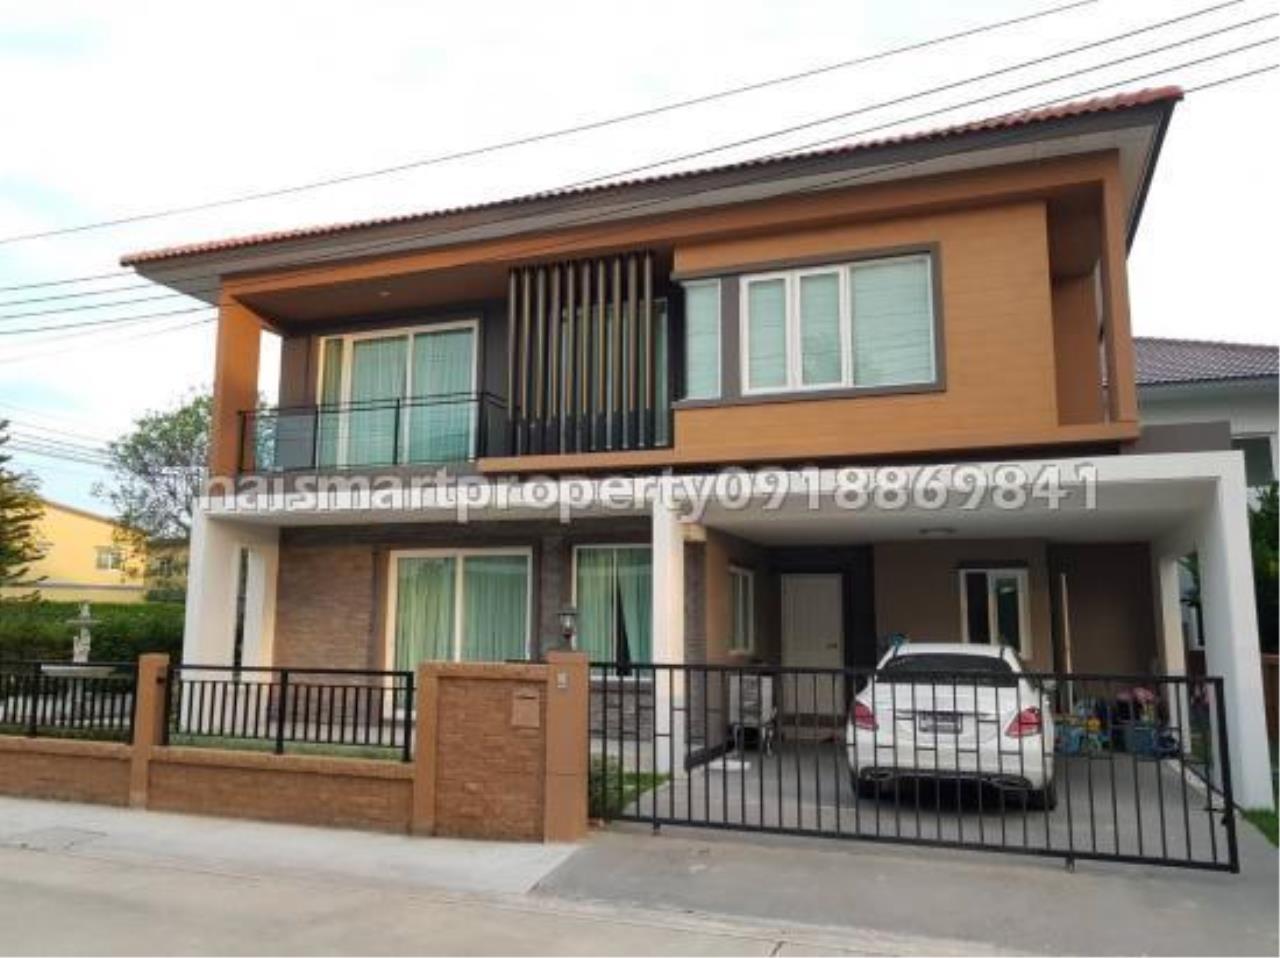 Thai Smart Property Agency's Single house Golden village On Nut - Pattanakarn 2